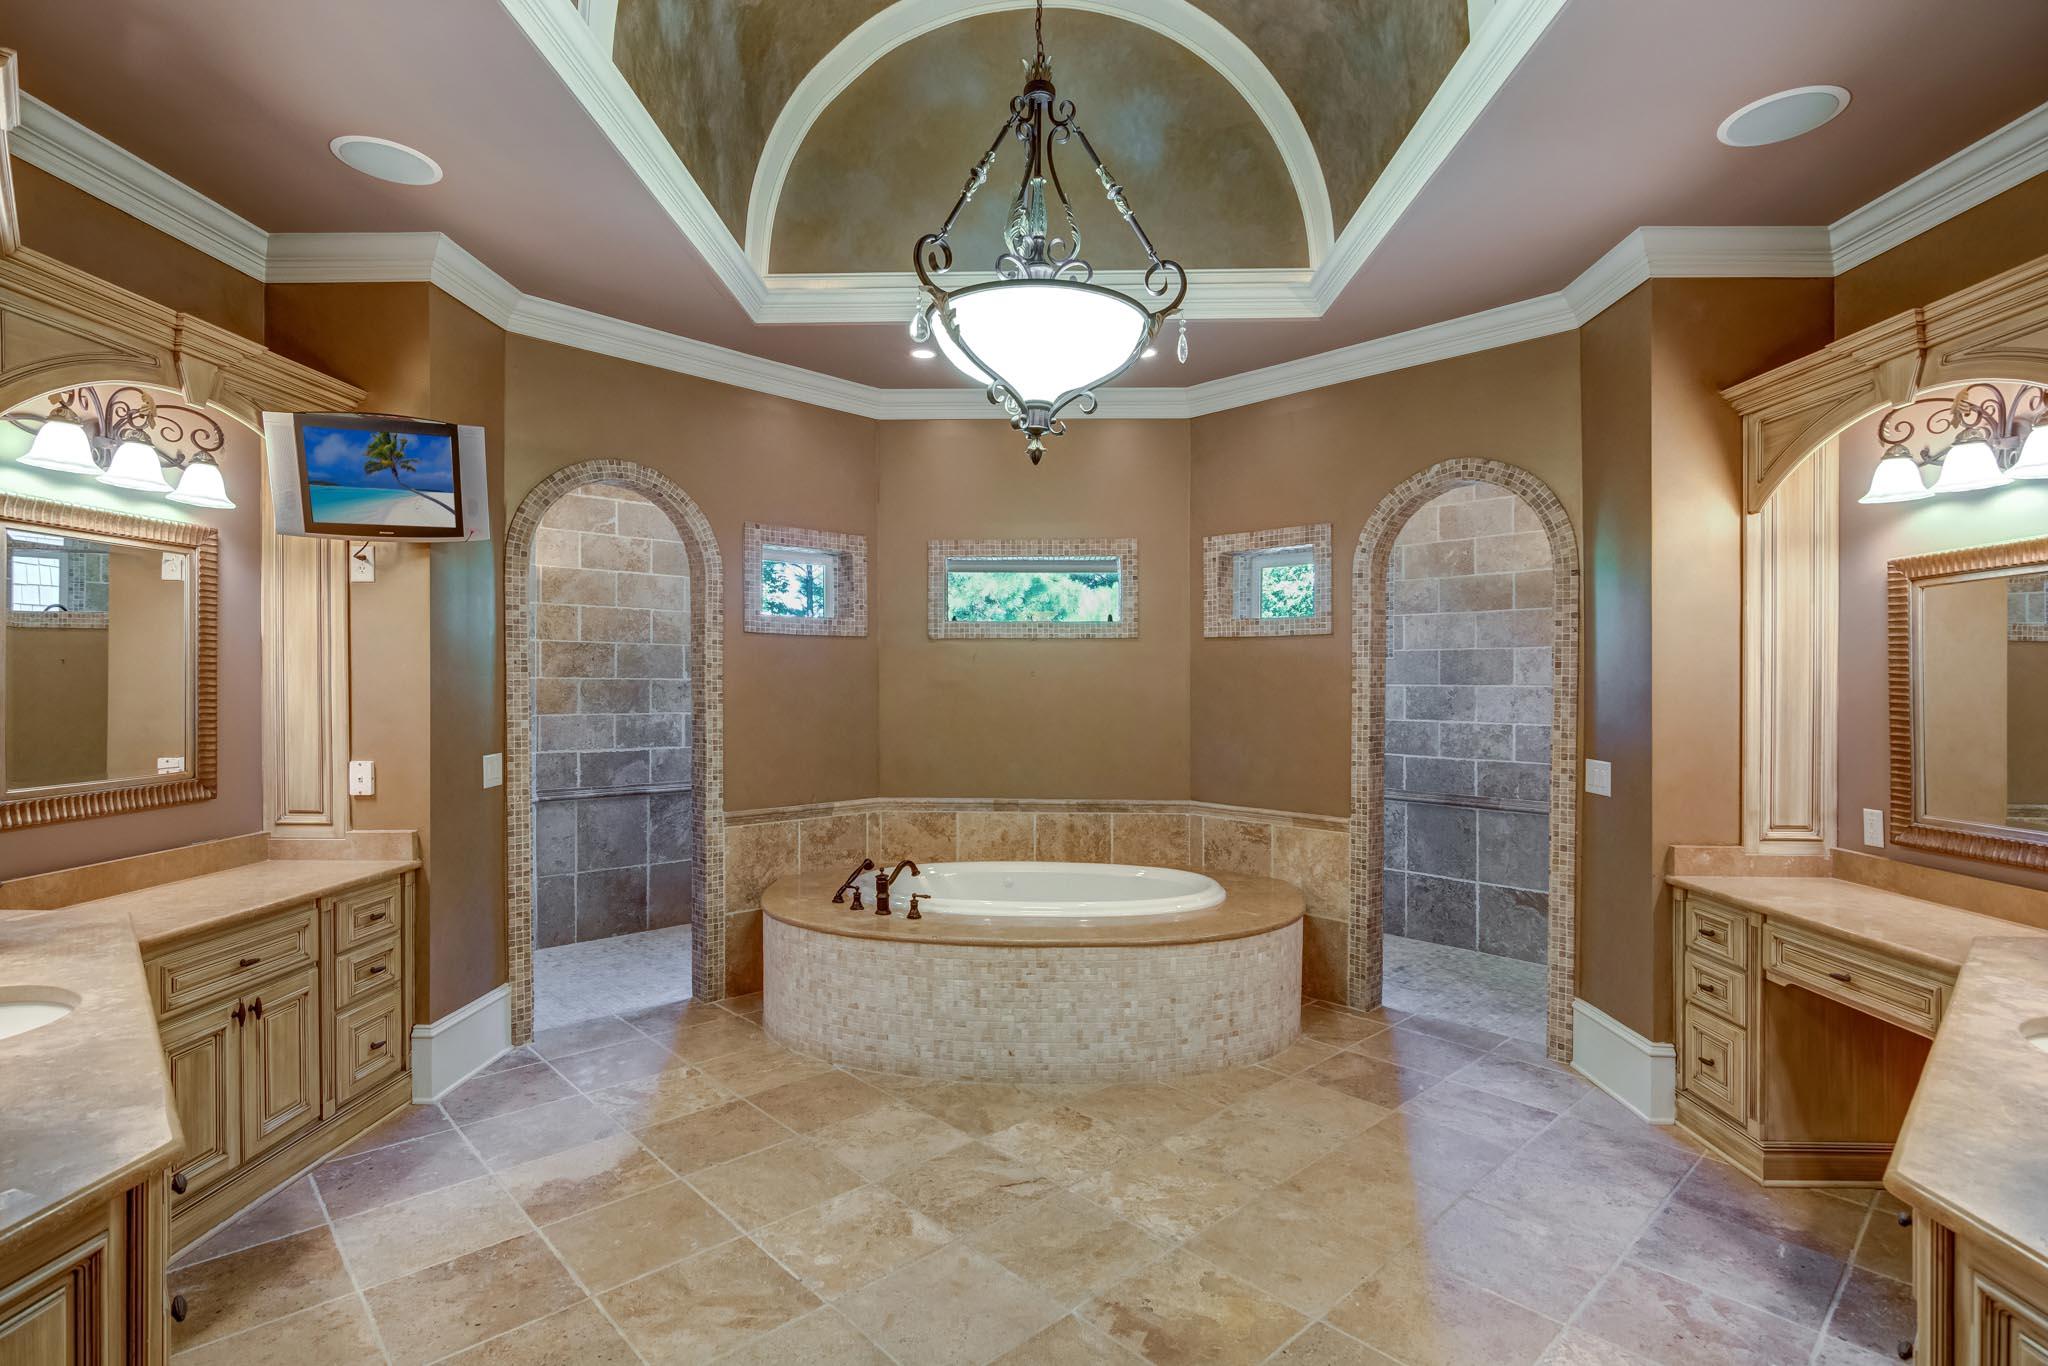 real_estate_photographer_bathroom_photography-1.jpg